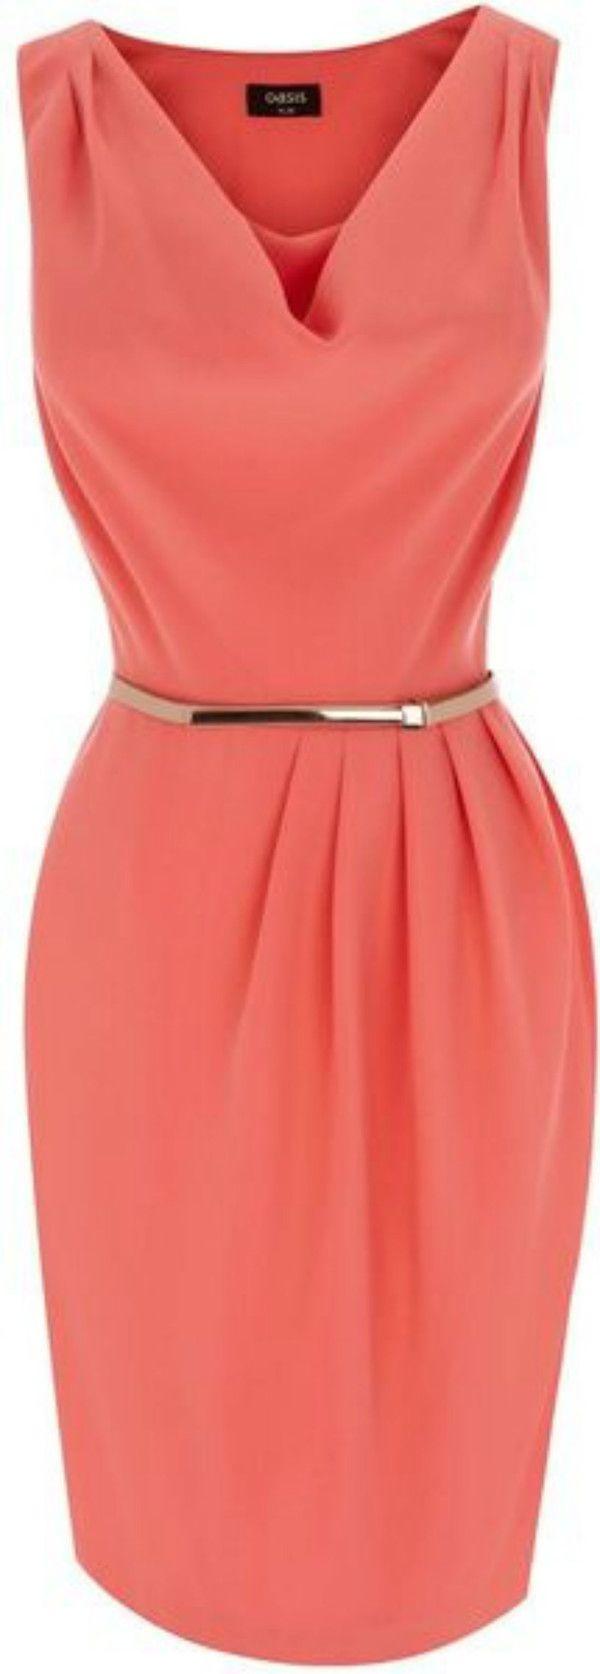 nice pleats dress